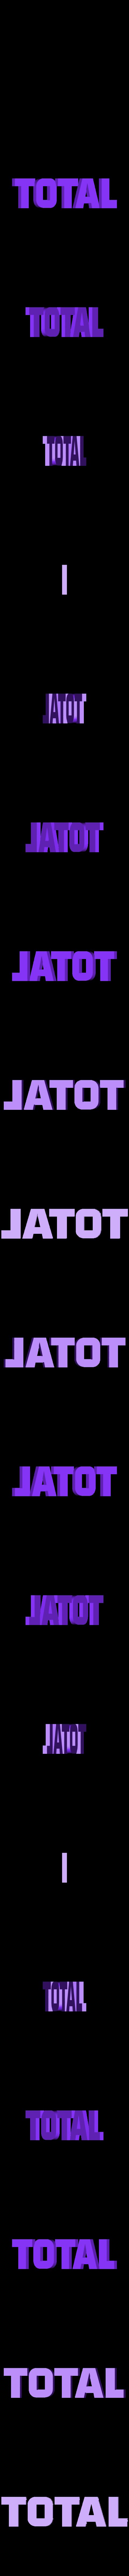 logo_TOTAL_70_total_orange.STL Download free STL file TOTAL logo 1970 • Template to 3D print, lulu3Dbuilder